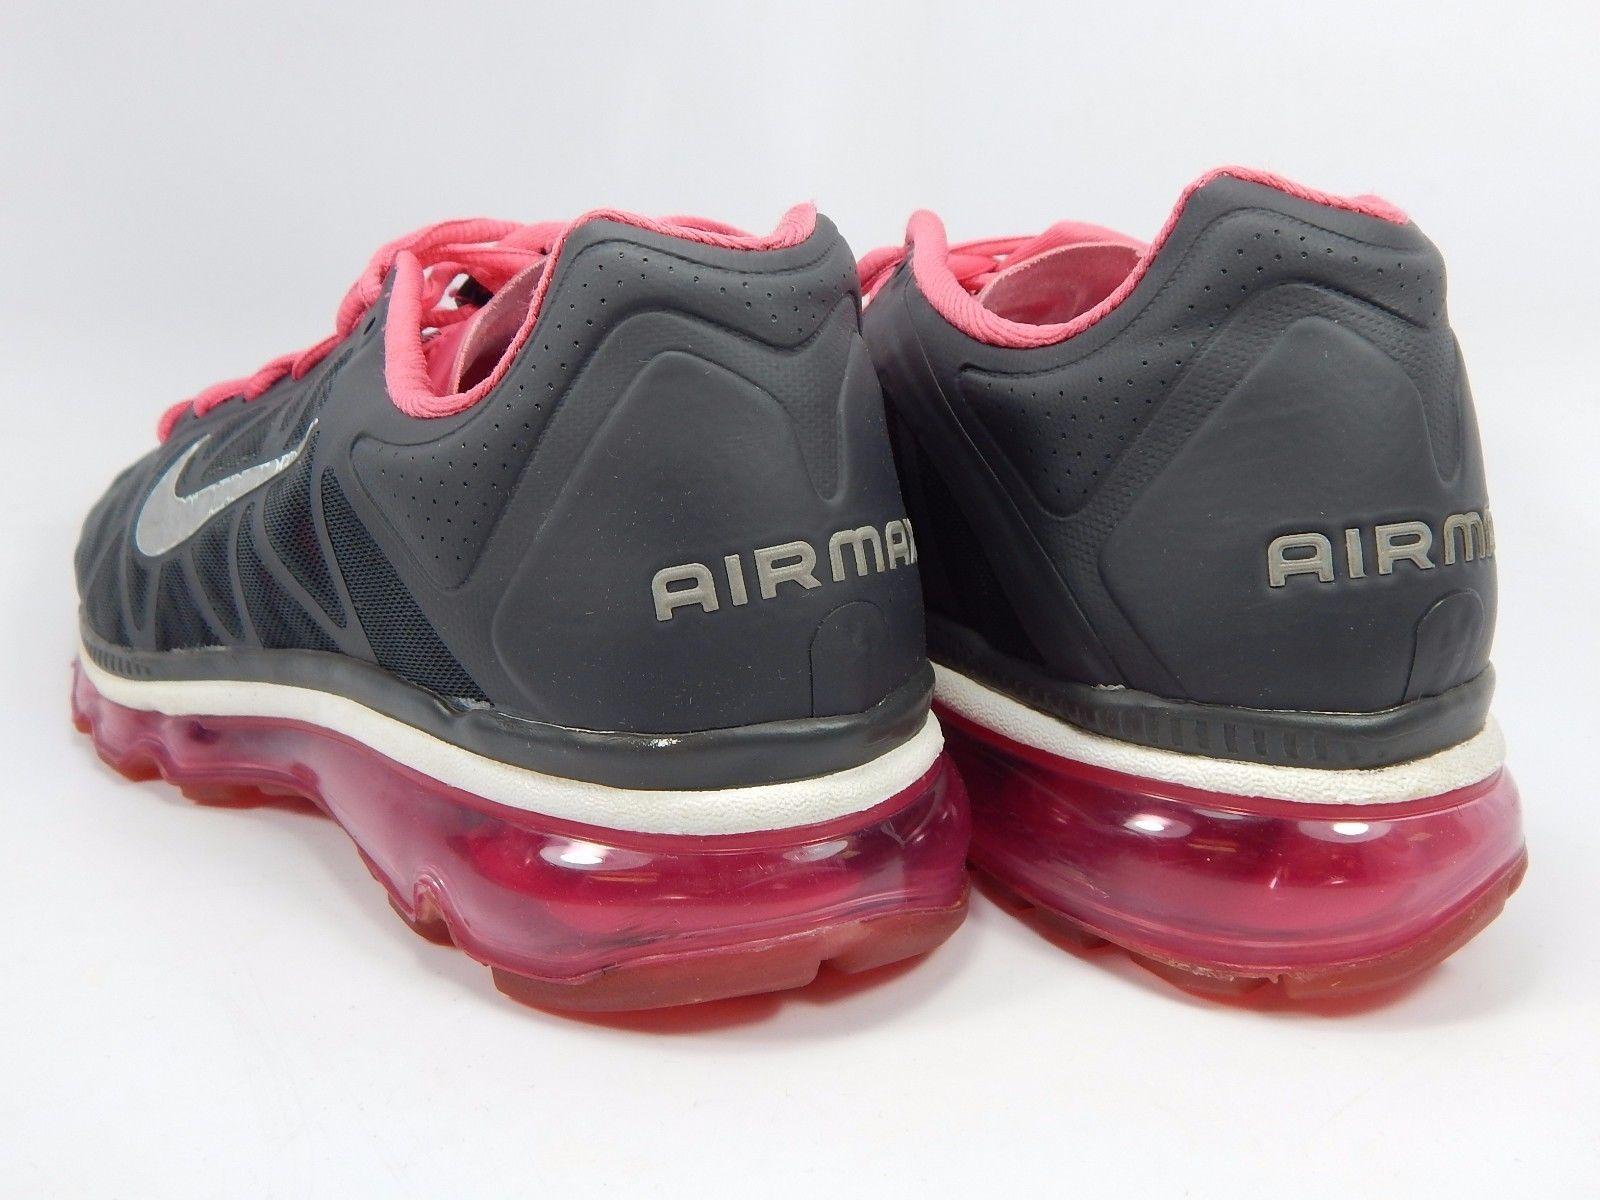 Nike Air Max+ 2011 Women's Running Shoes Size US 8 M (B) EU 39 Gray 429890-006